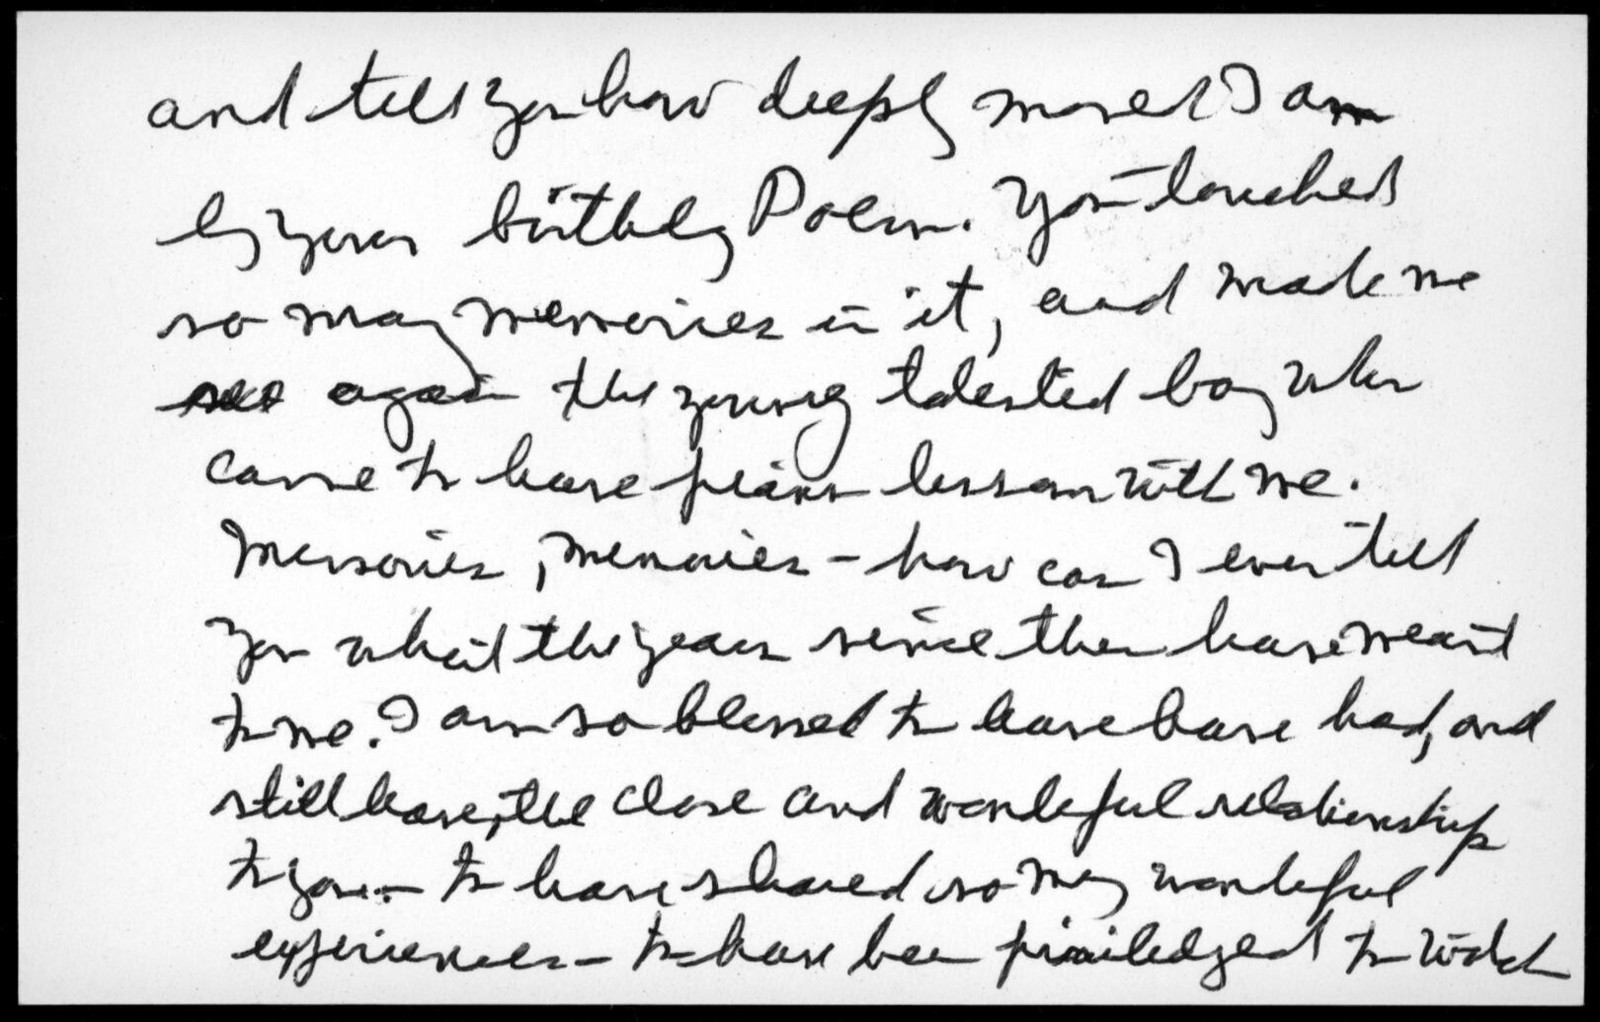 Letter from Helen Coates to Leonard Bernstein, July 22, 1985